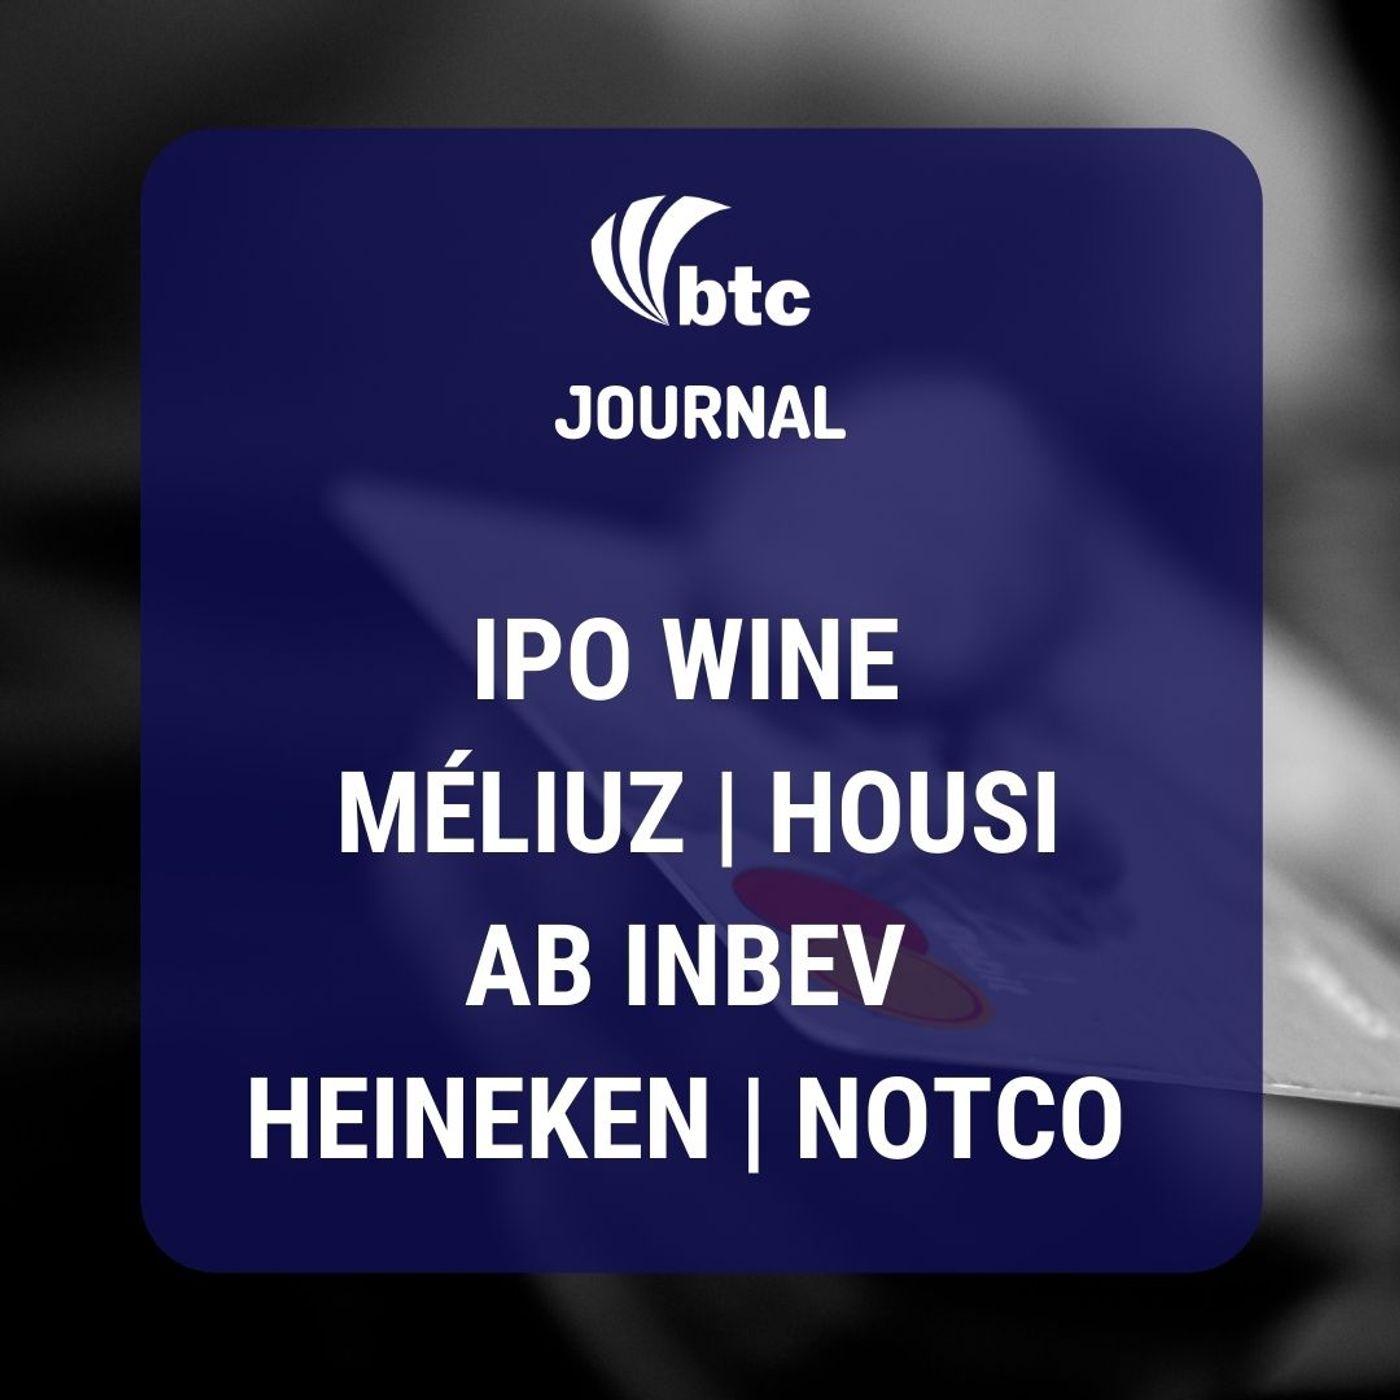 IPO Wine, Méliuz, Housi, AB Inbev, Heineken, NotCo, e LVMH vs Tiffany | BTC Journal 10/09/20